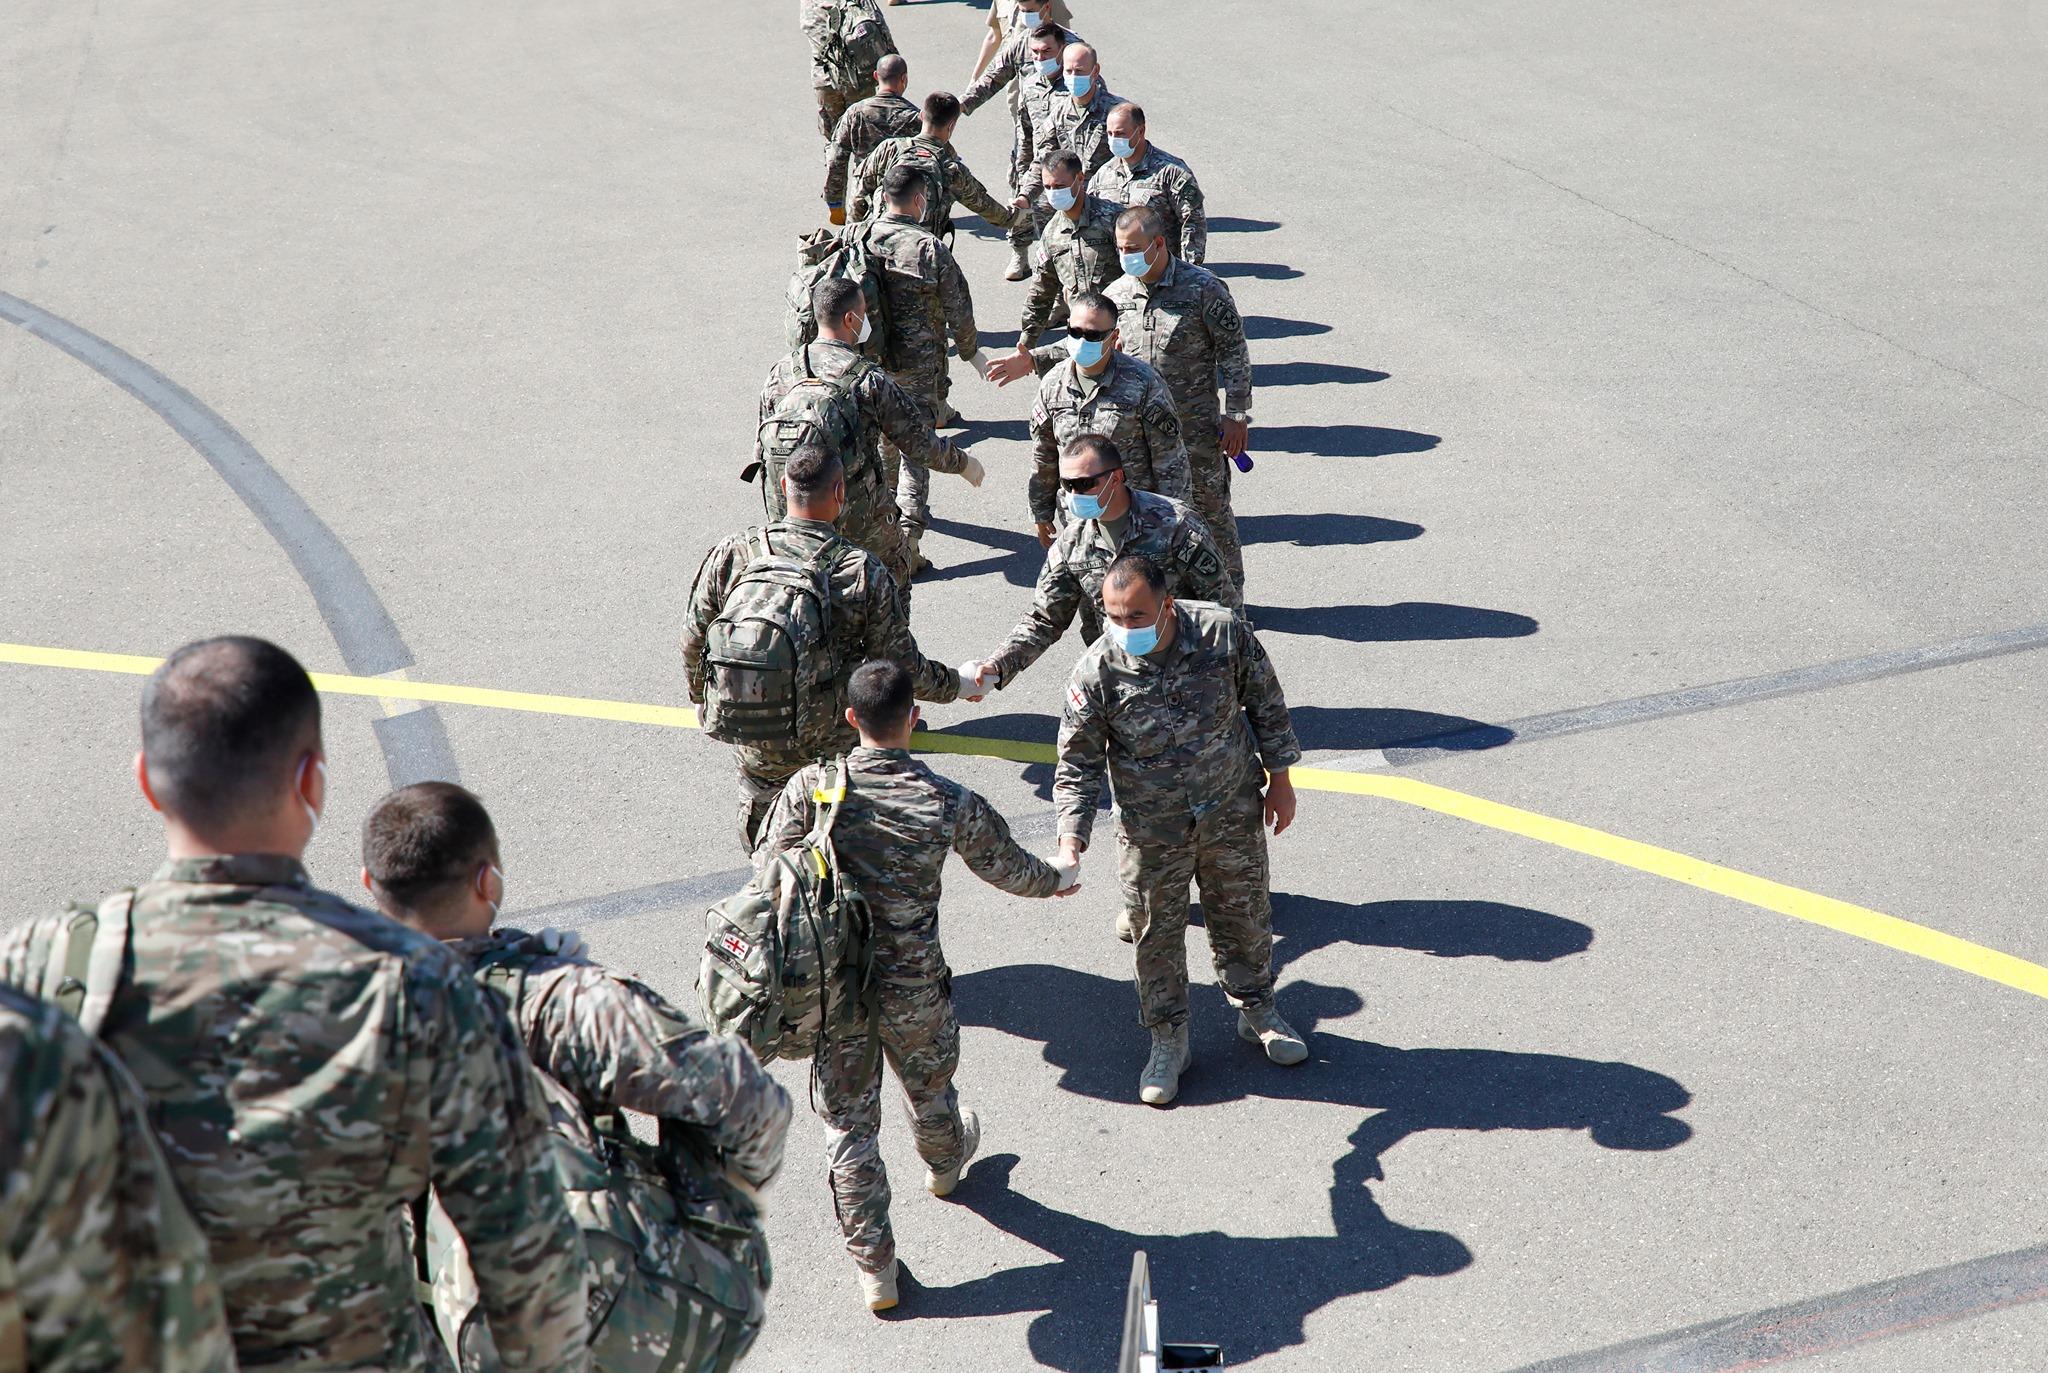 189613083 4402566666442708 7103442355924921325 n #новости Афганистан, Грузия-Германия, миссия в Афганистане, Хуберт Книрш